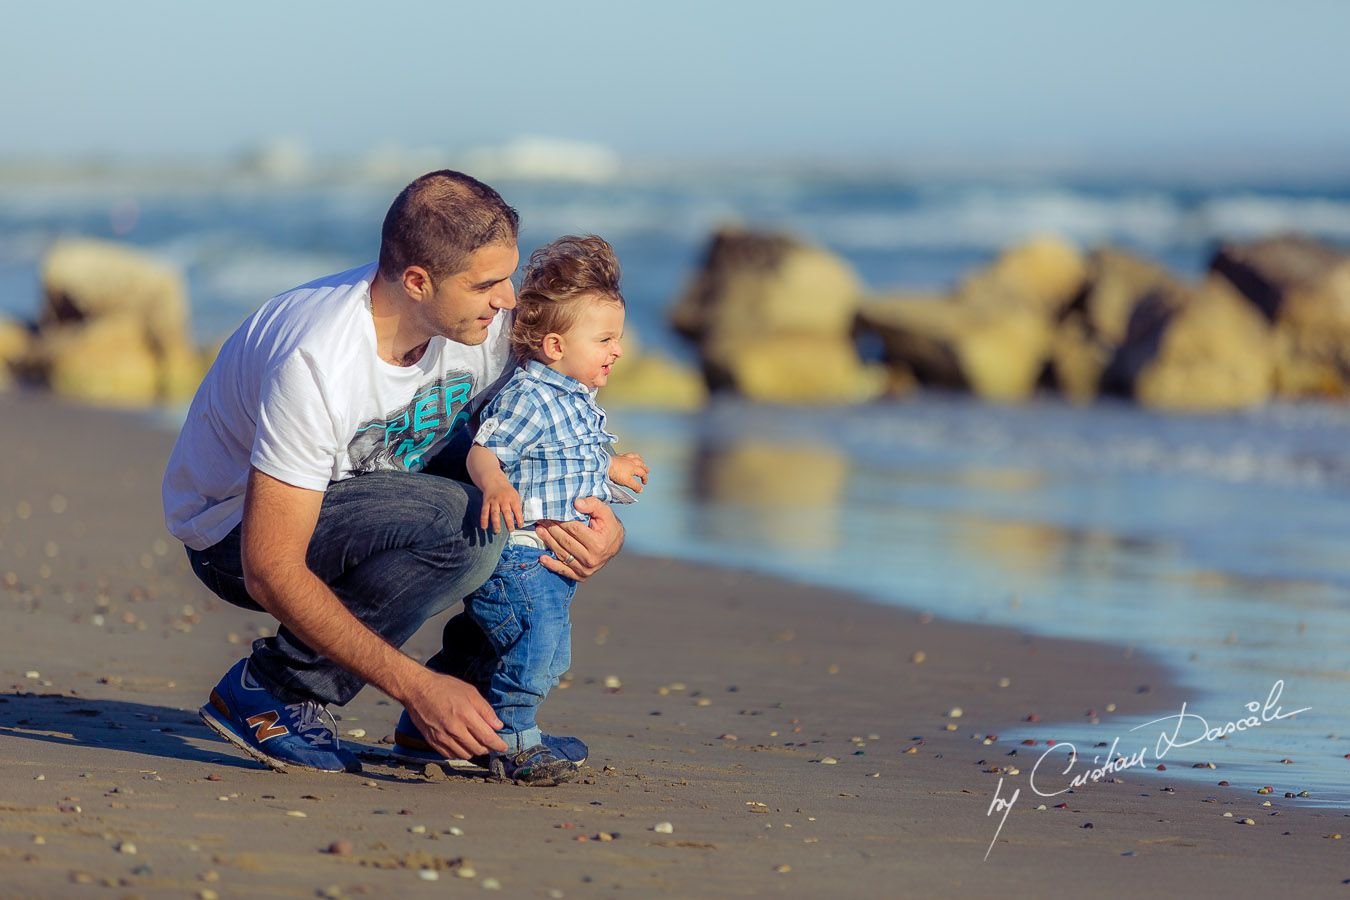 Precious moments: George & Harry at Curium Beach, Cyprus. Photographer: Cristian Dascalu